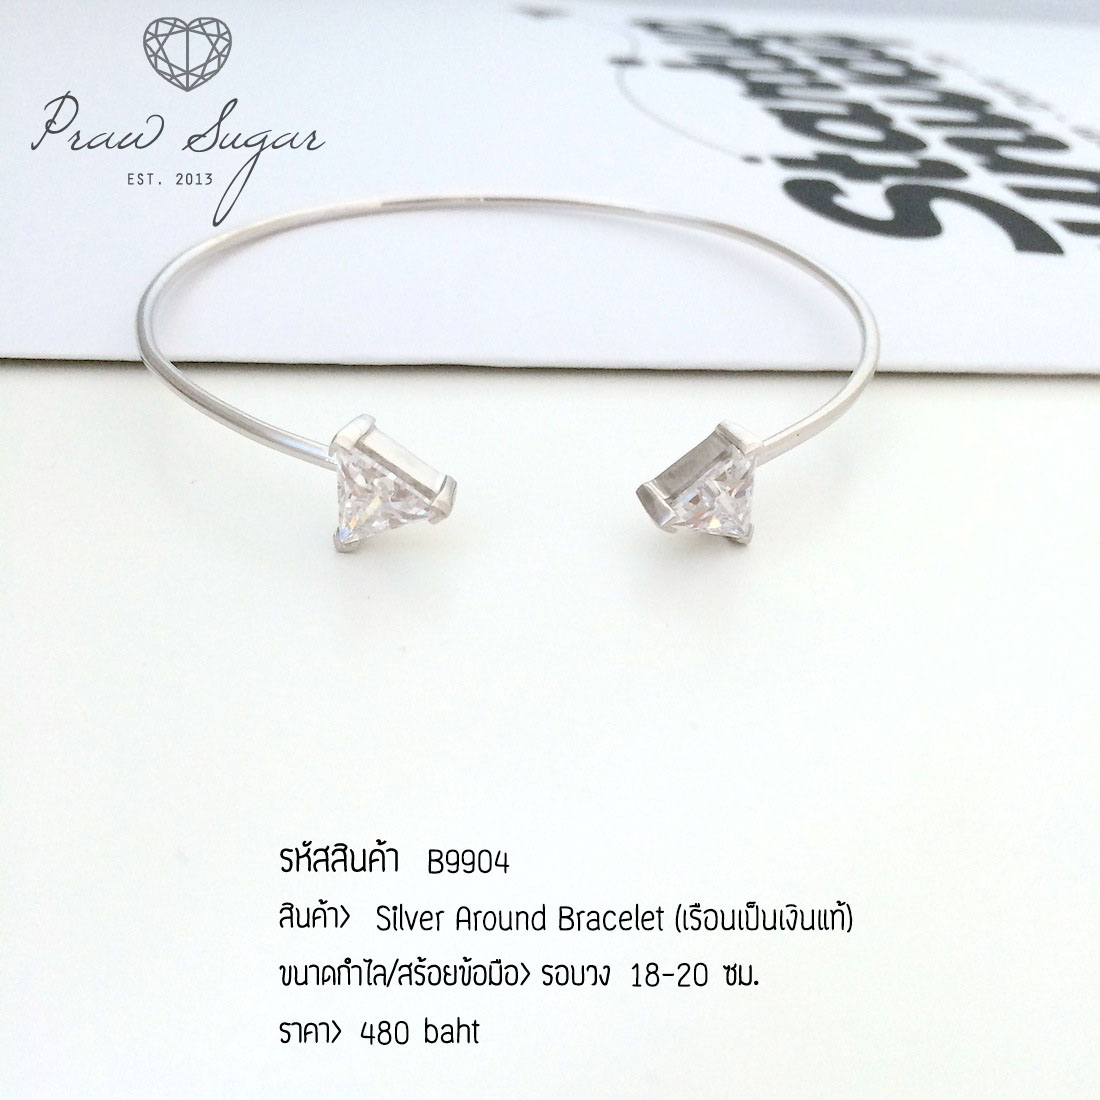 Silver Around Bracelet (เรือนเป็นเงินแท้)